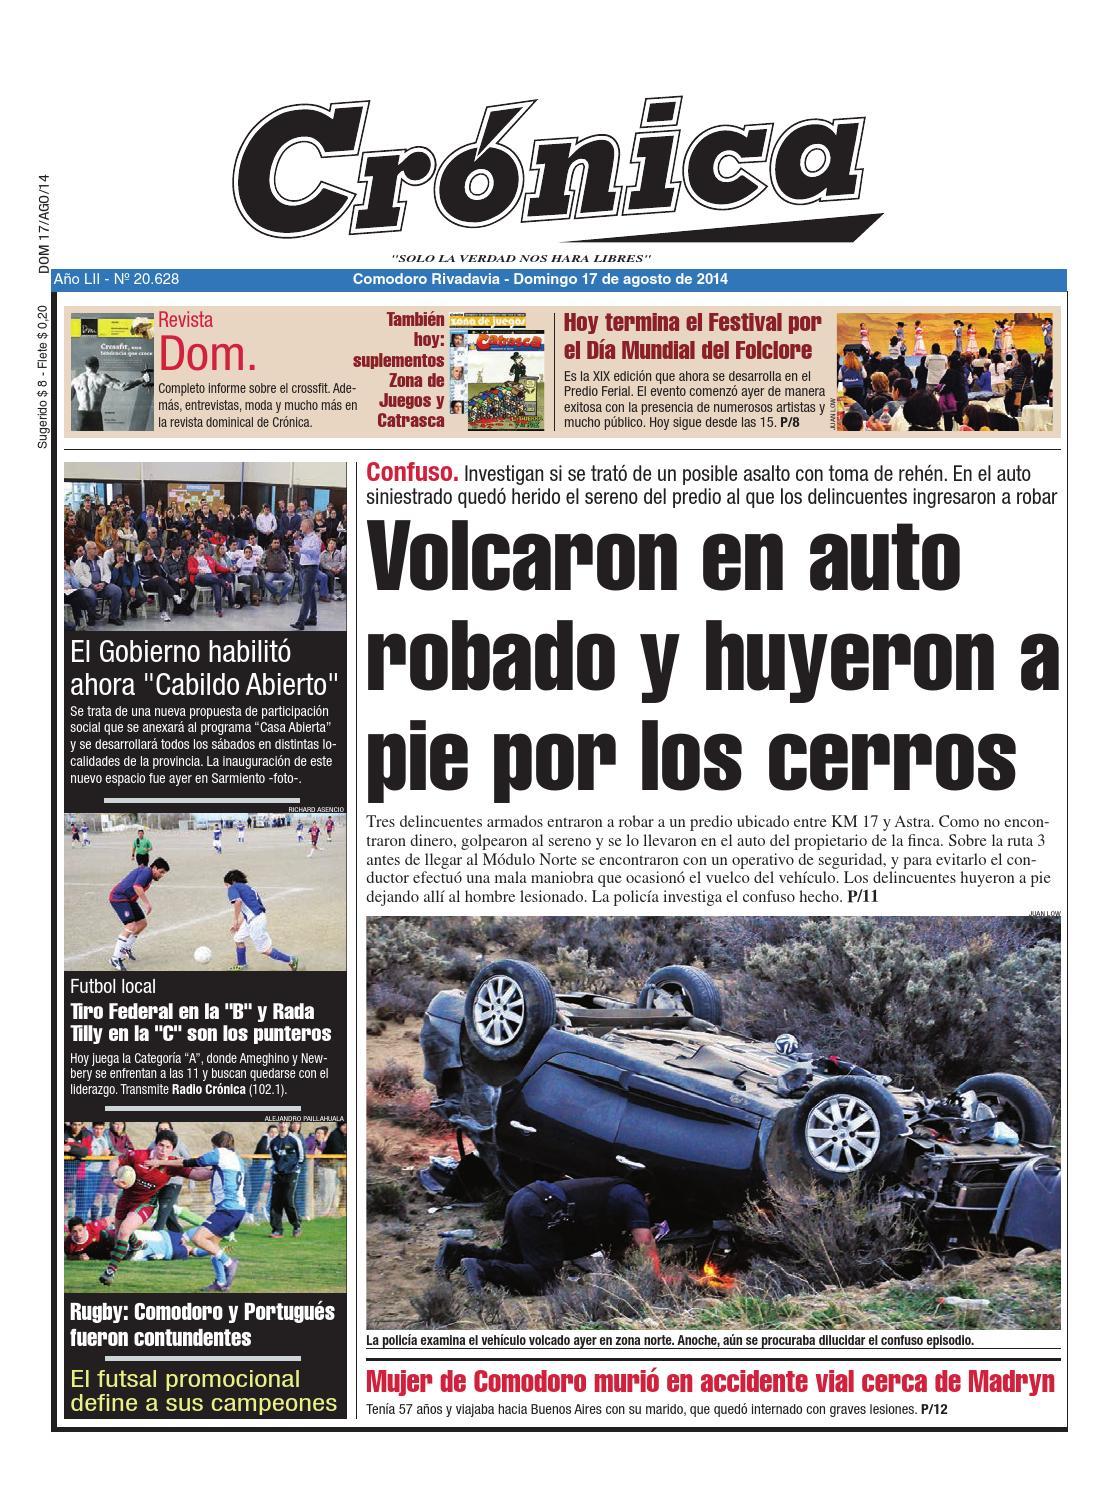 Db203b3ace9c5e70e681d57be5c495f9 By Diario Cr Nica Issuu # Muebles Doblecinco